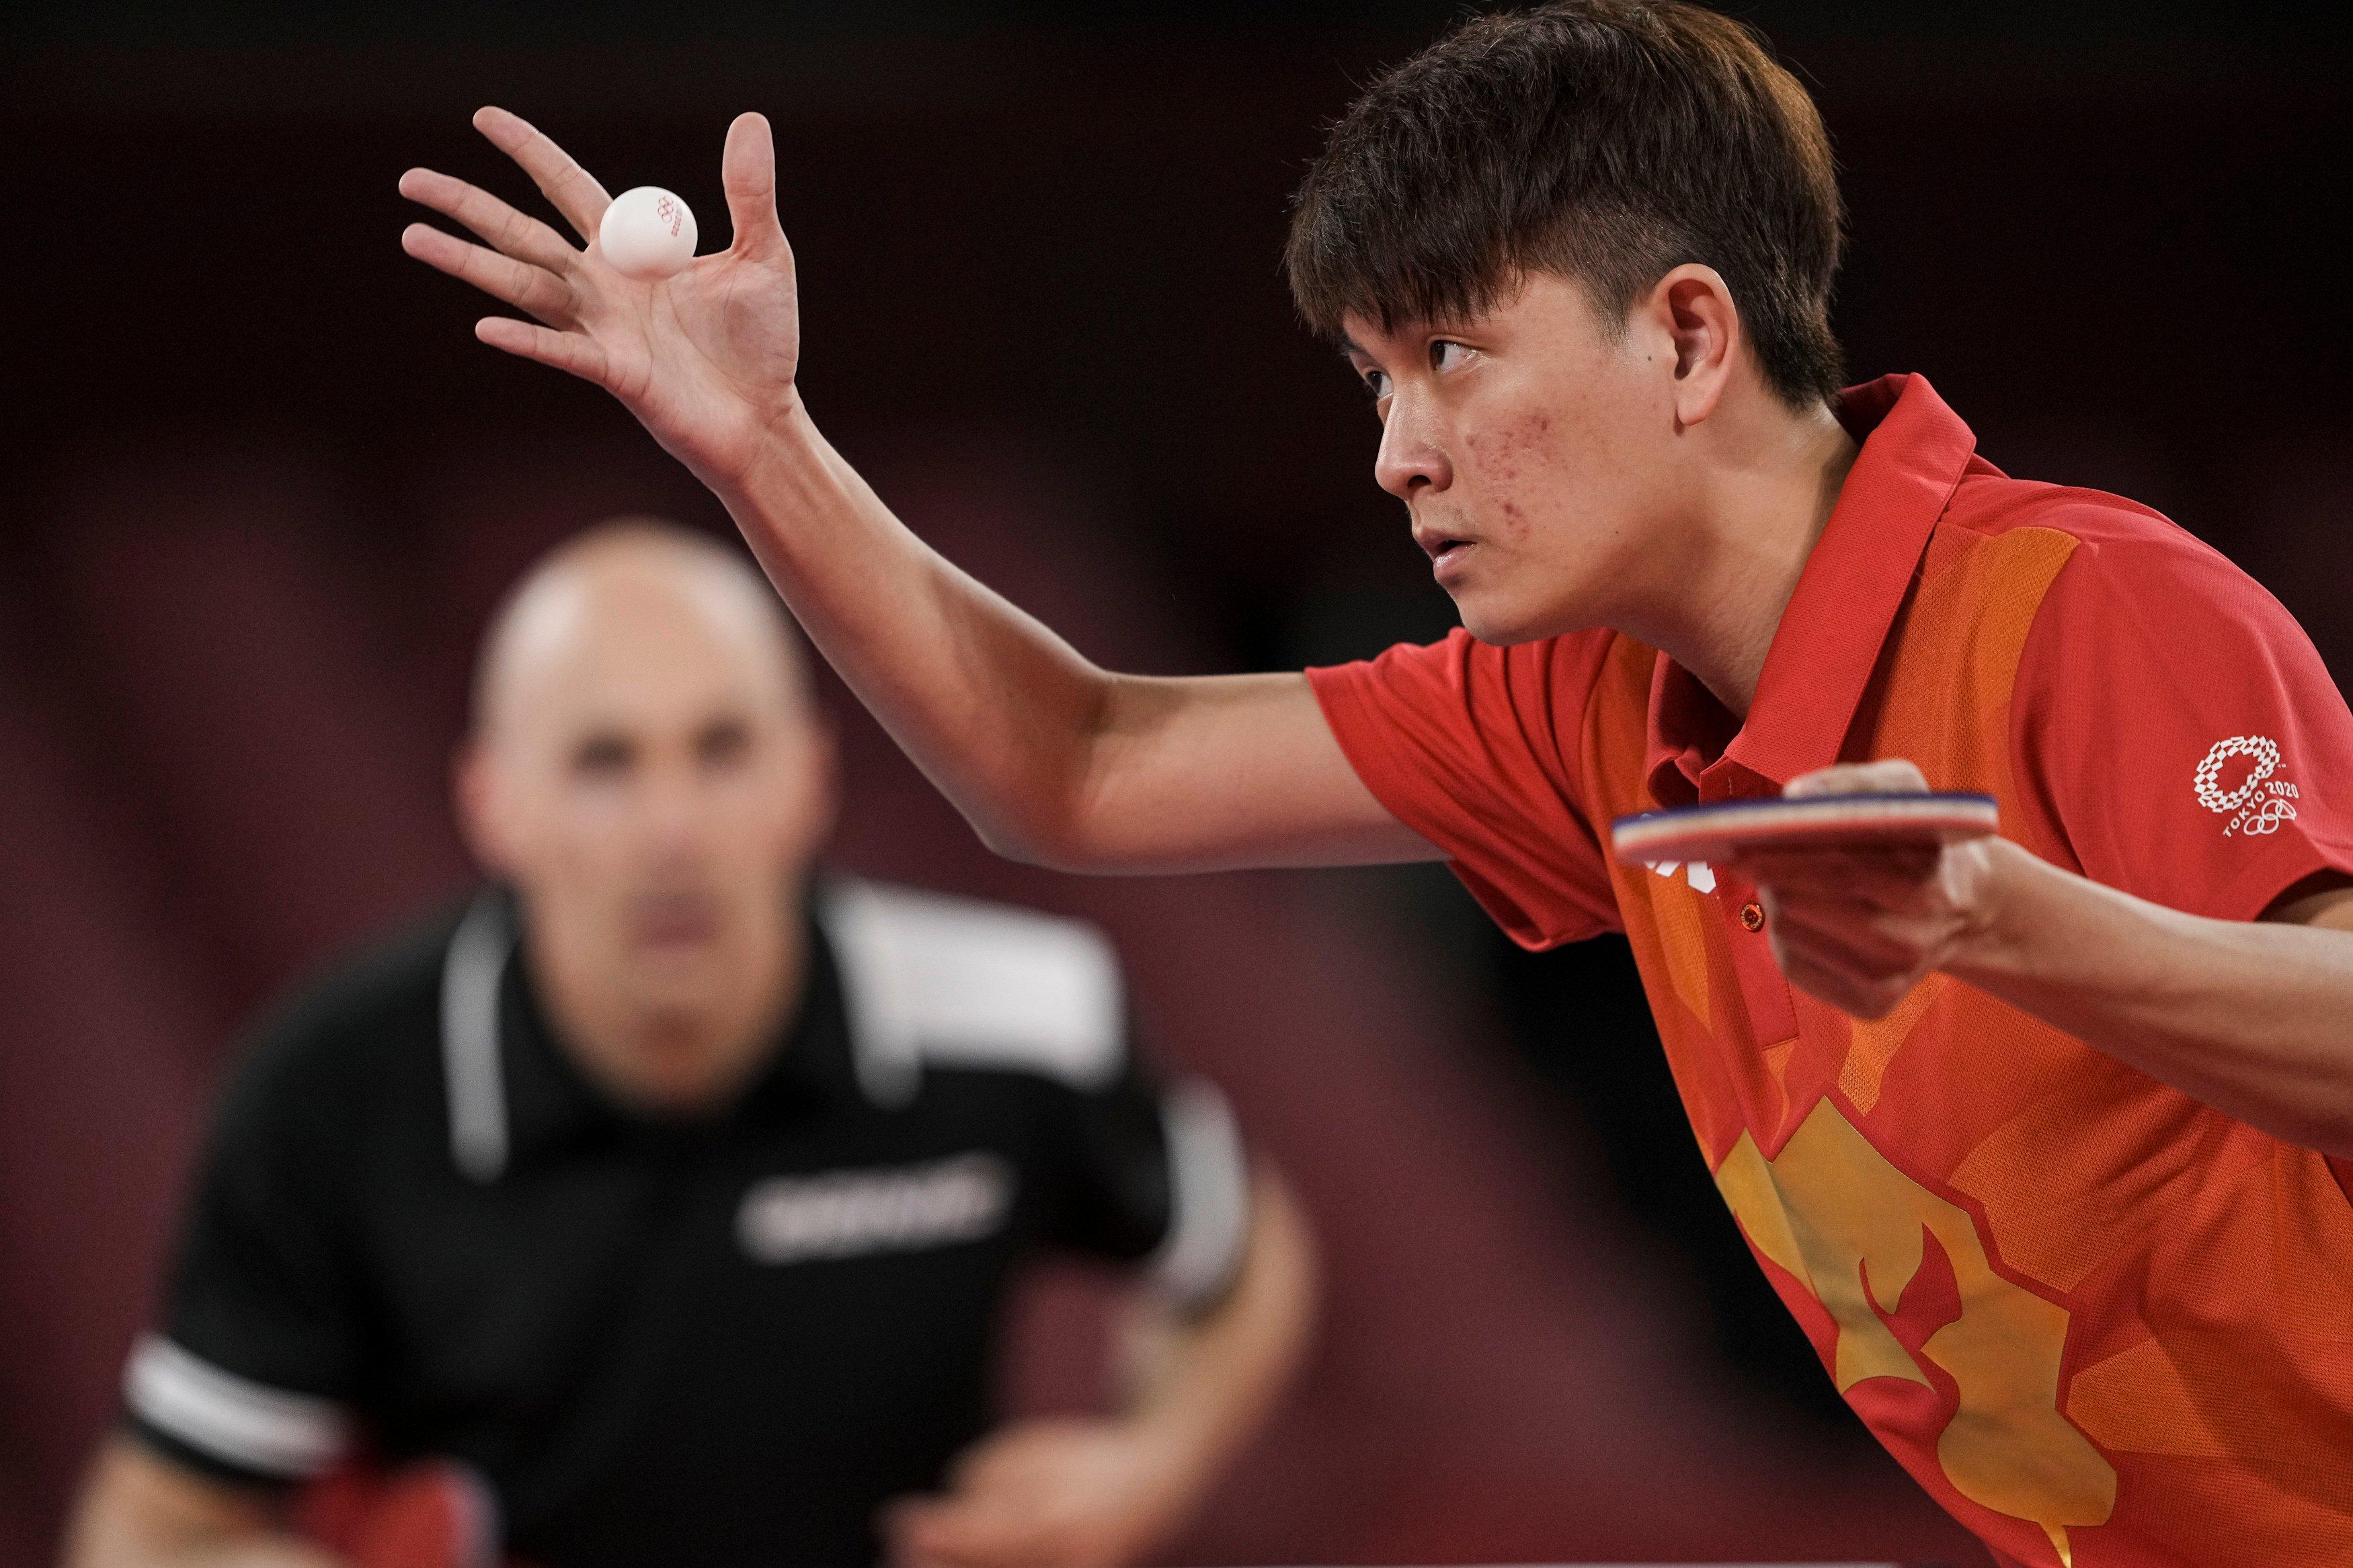 20210725_Table Tennis_1CY1780